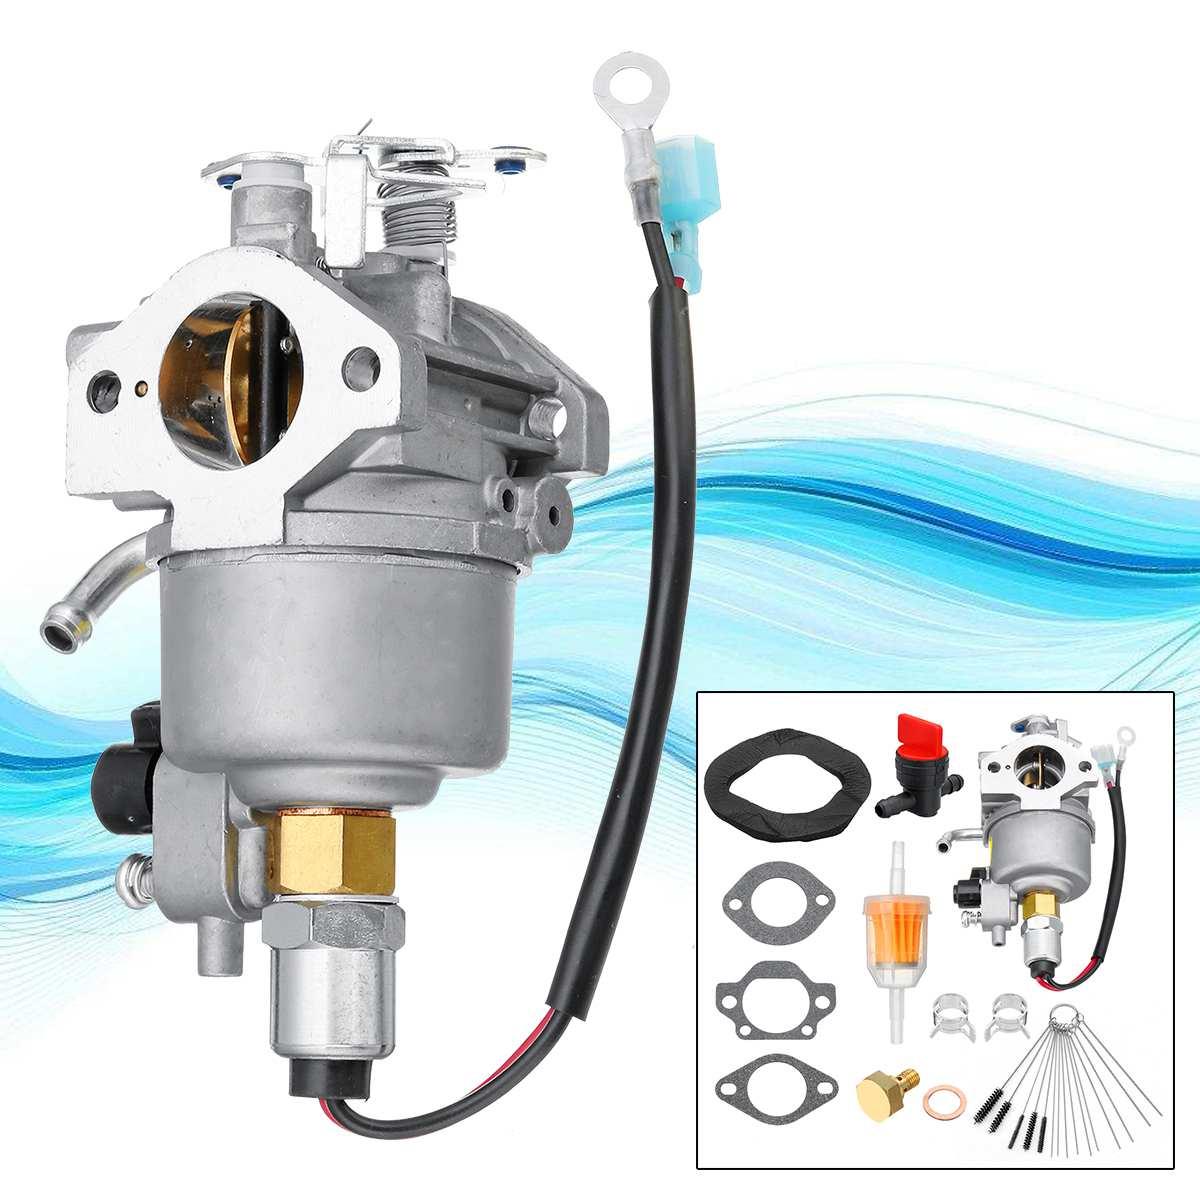 carburetor rebuild kit replaces onan kit a041d736 for onan engine model onan marvel schebler model 4000w 4kyfa26100 in carburetors from automobiles  [ 1200 x 1200 Pixel ]